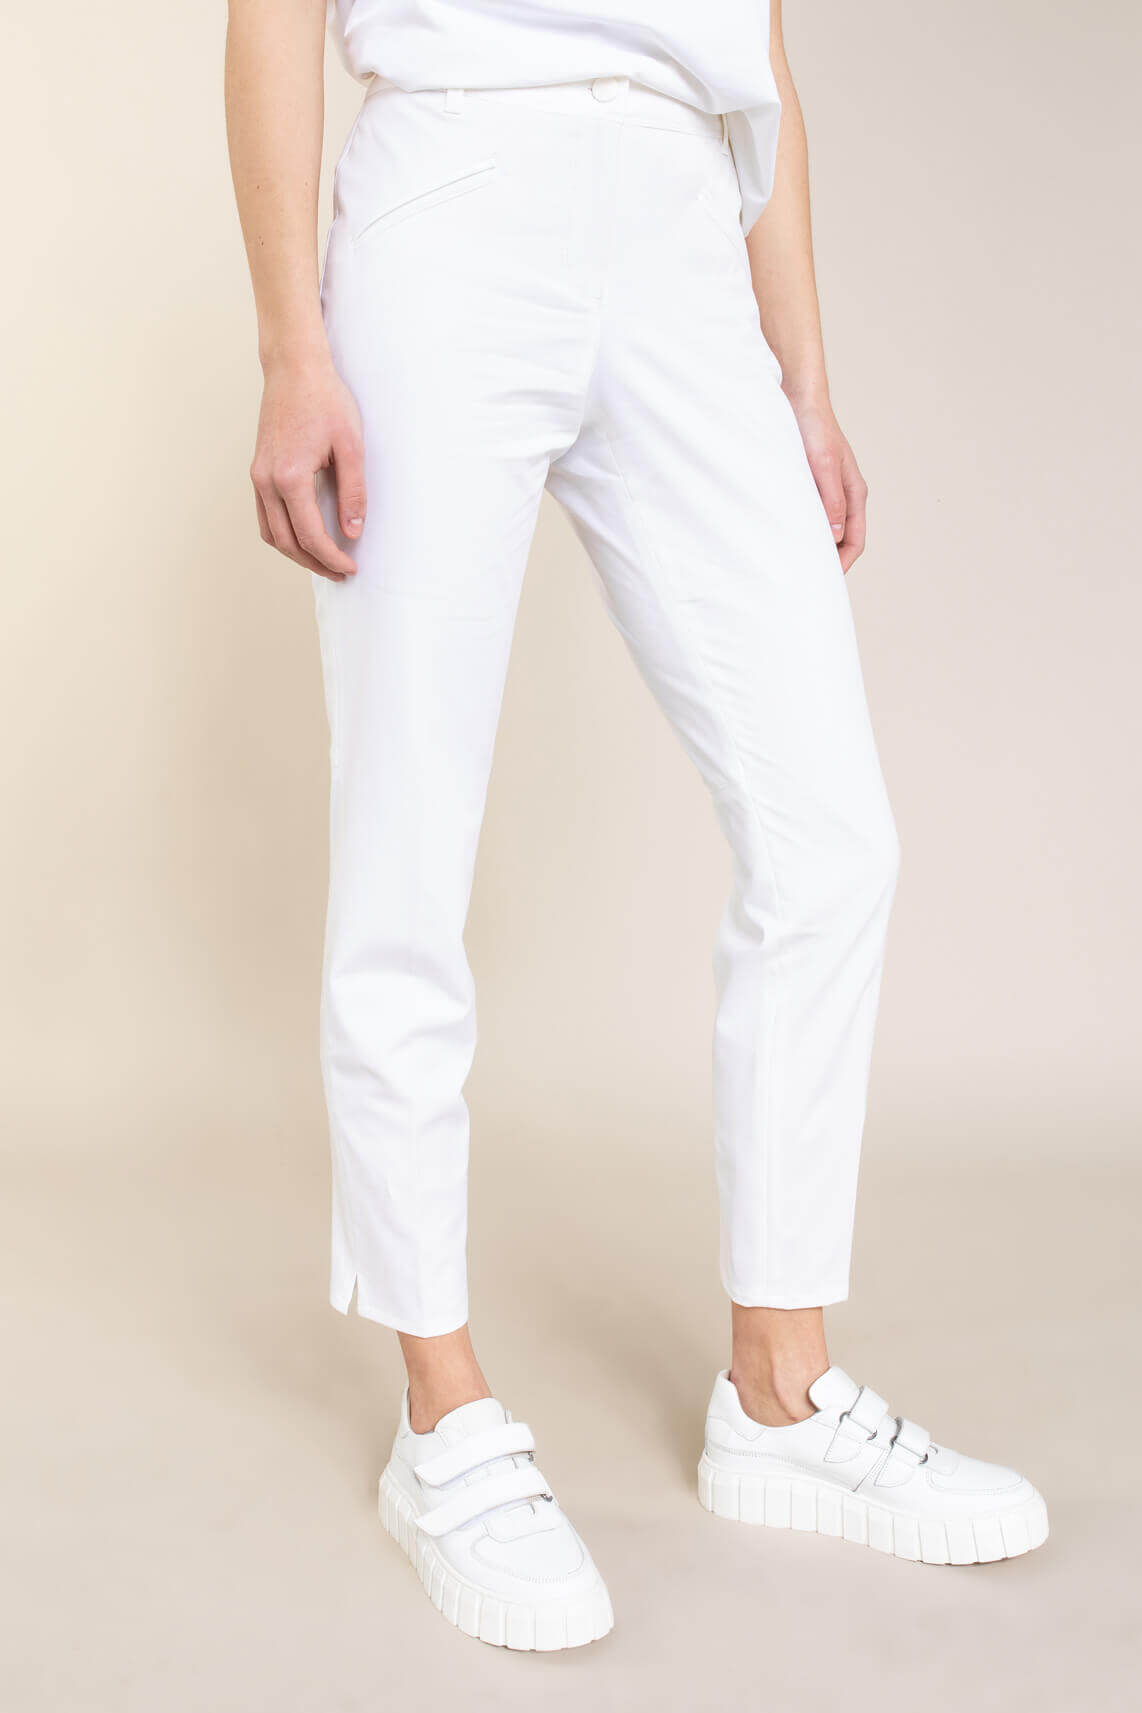 Cambio Dames Rachel pantalon Wit